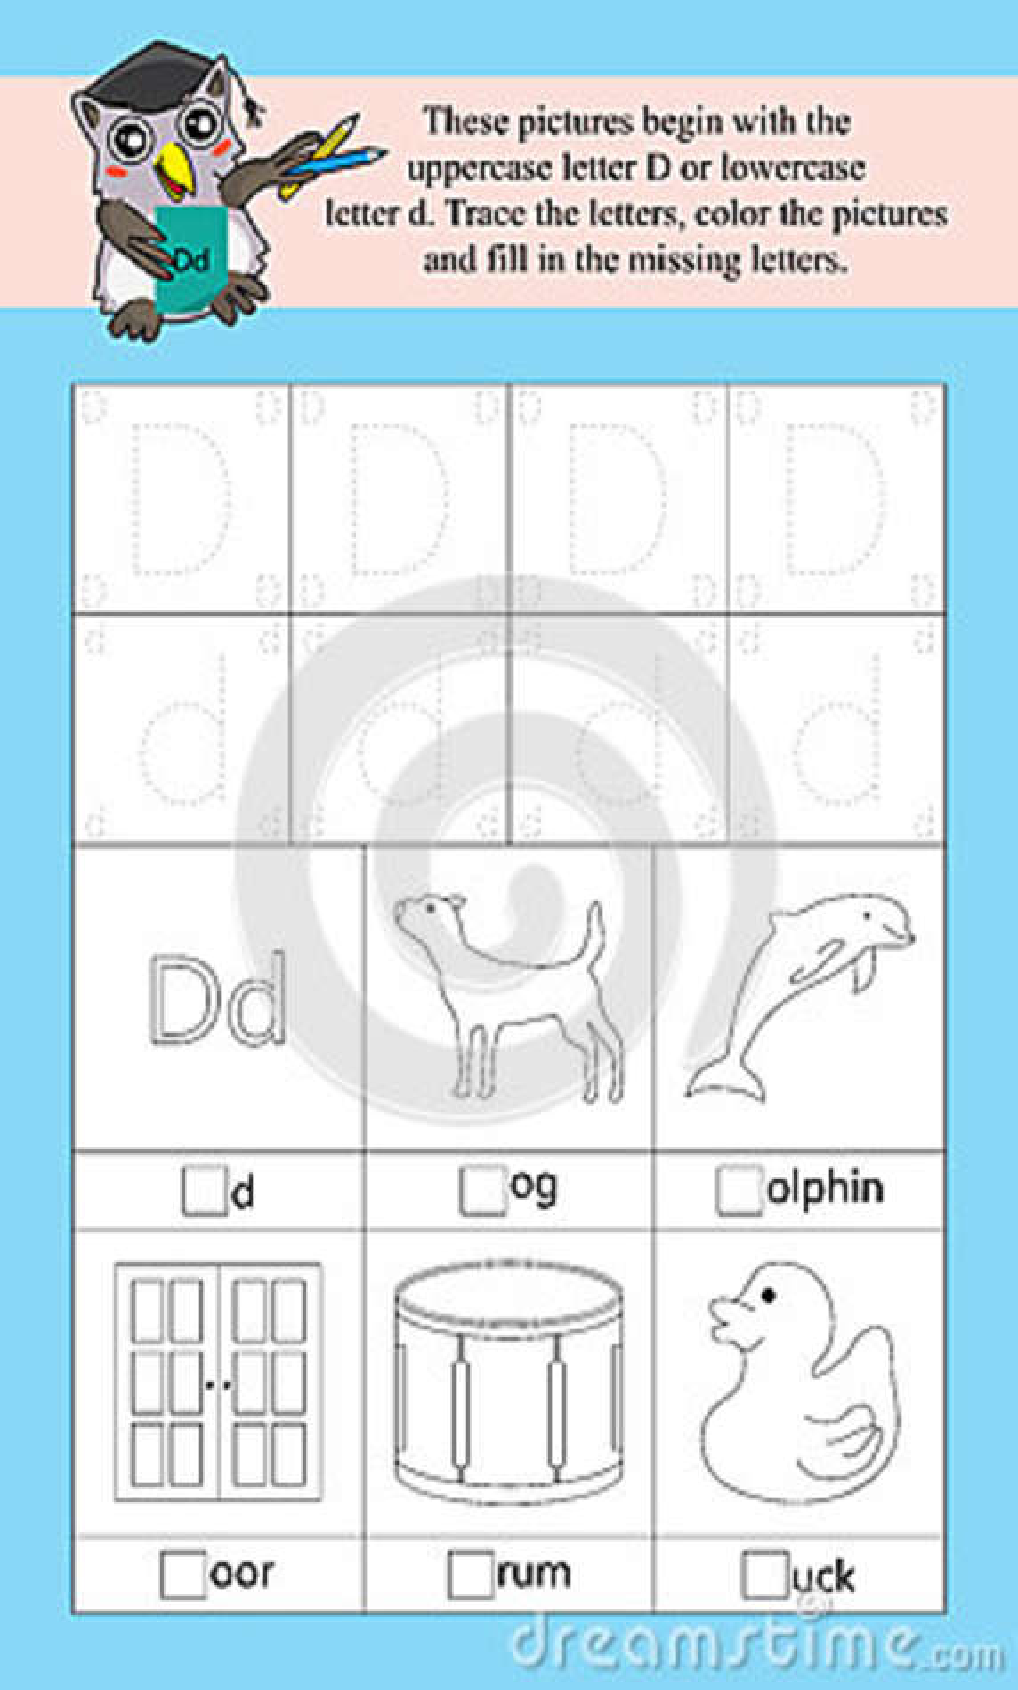 D Alphabet Template Stock Vector Illustration Of Capital 89516340